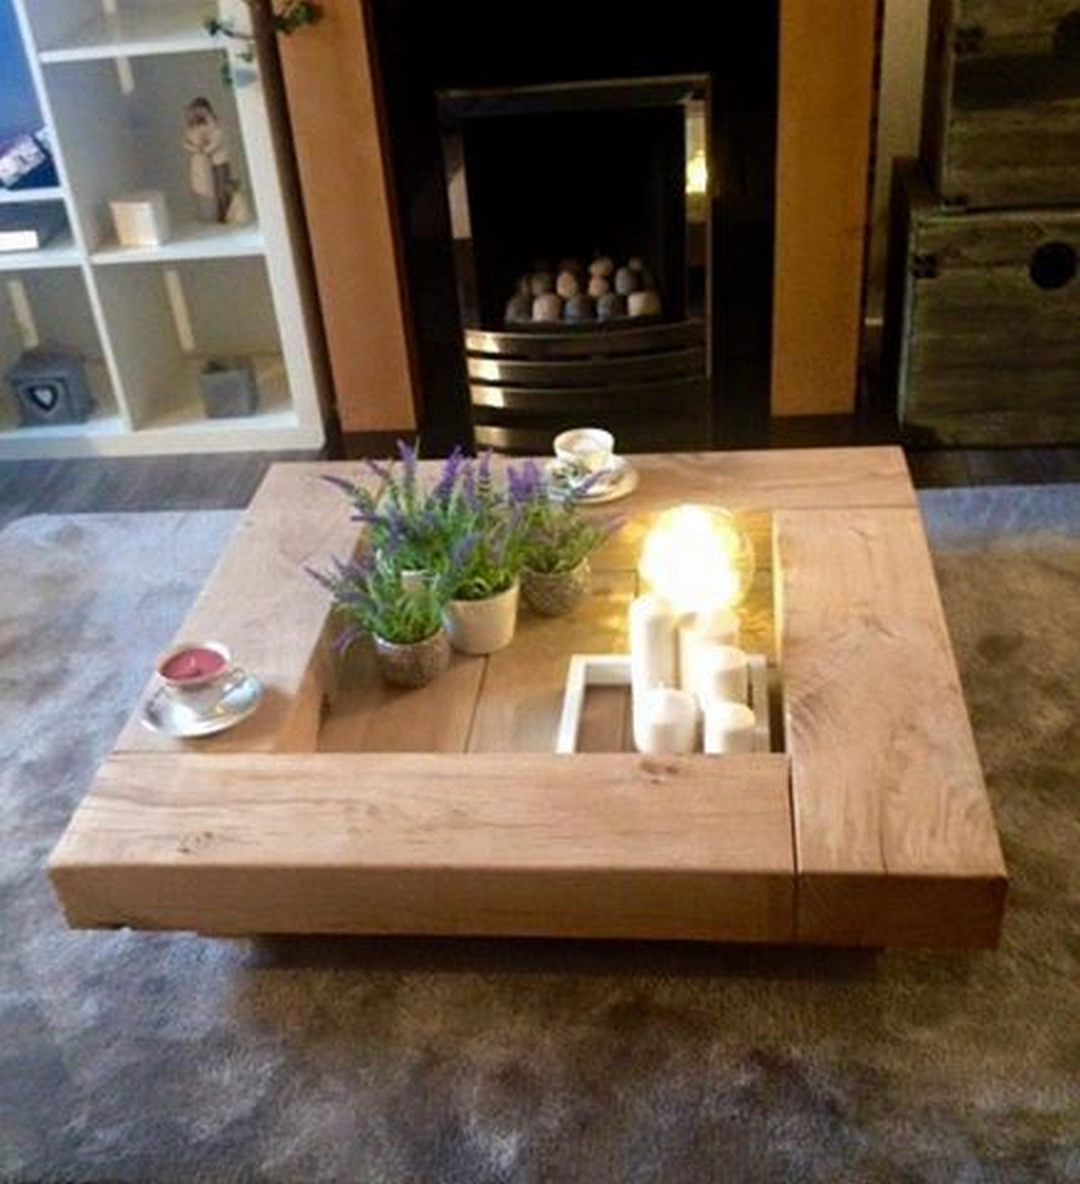 84 Wonderful Coffee Table Design Ideas